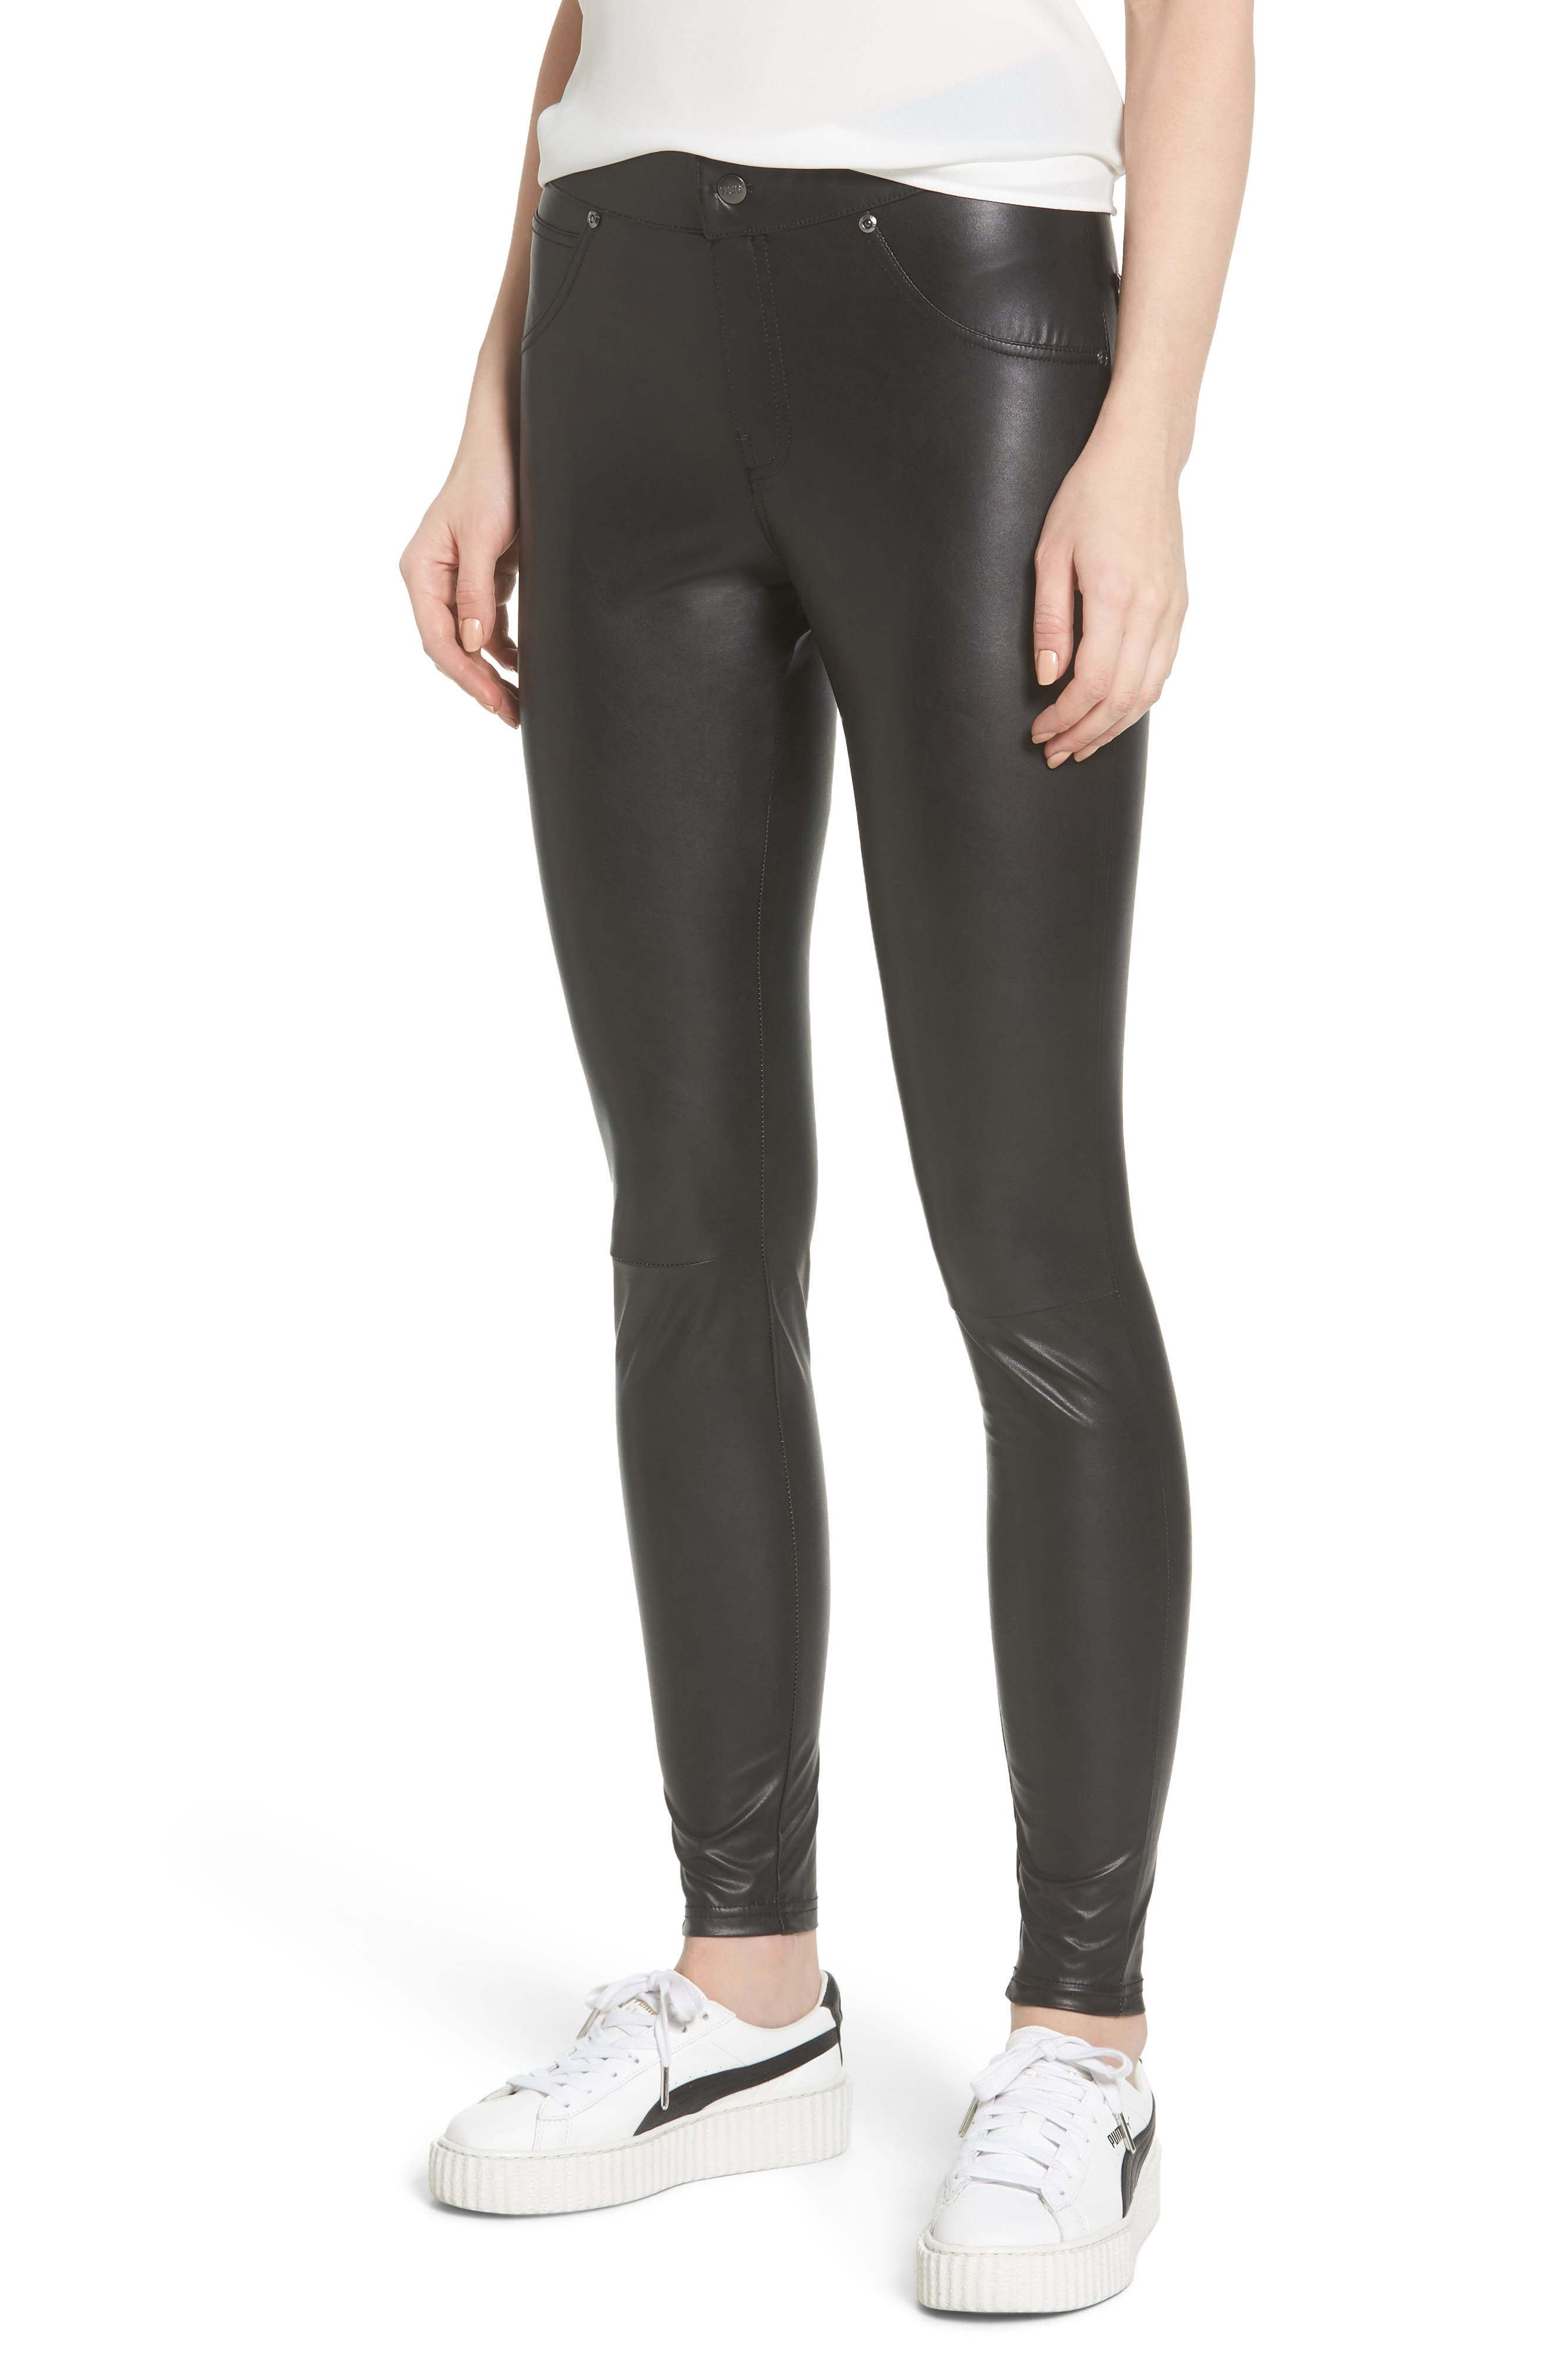 Alternate Image 1 Selected - Hue Leatherette Curvy Leggings